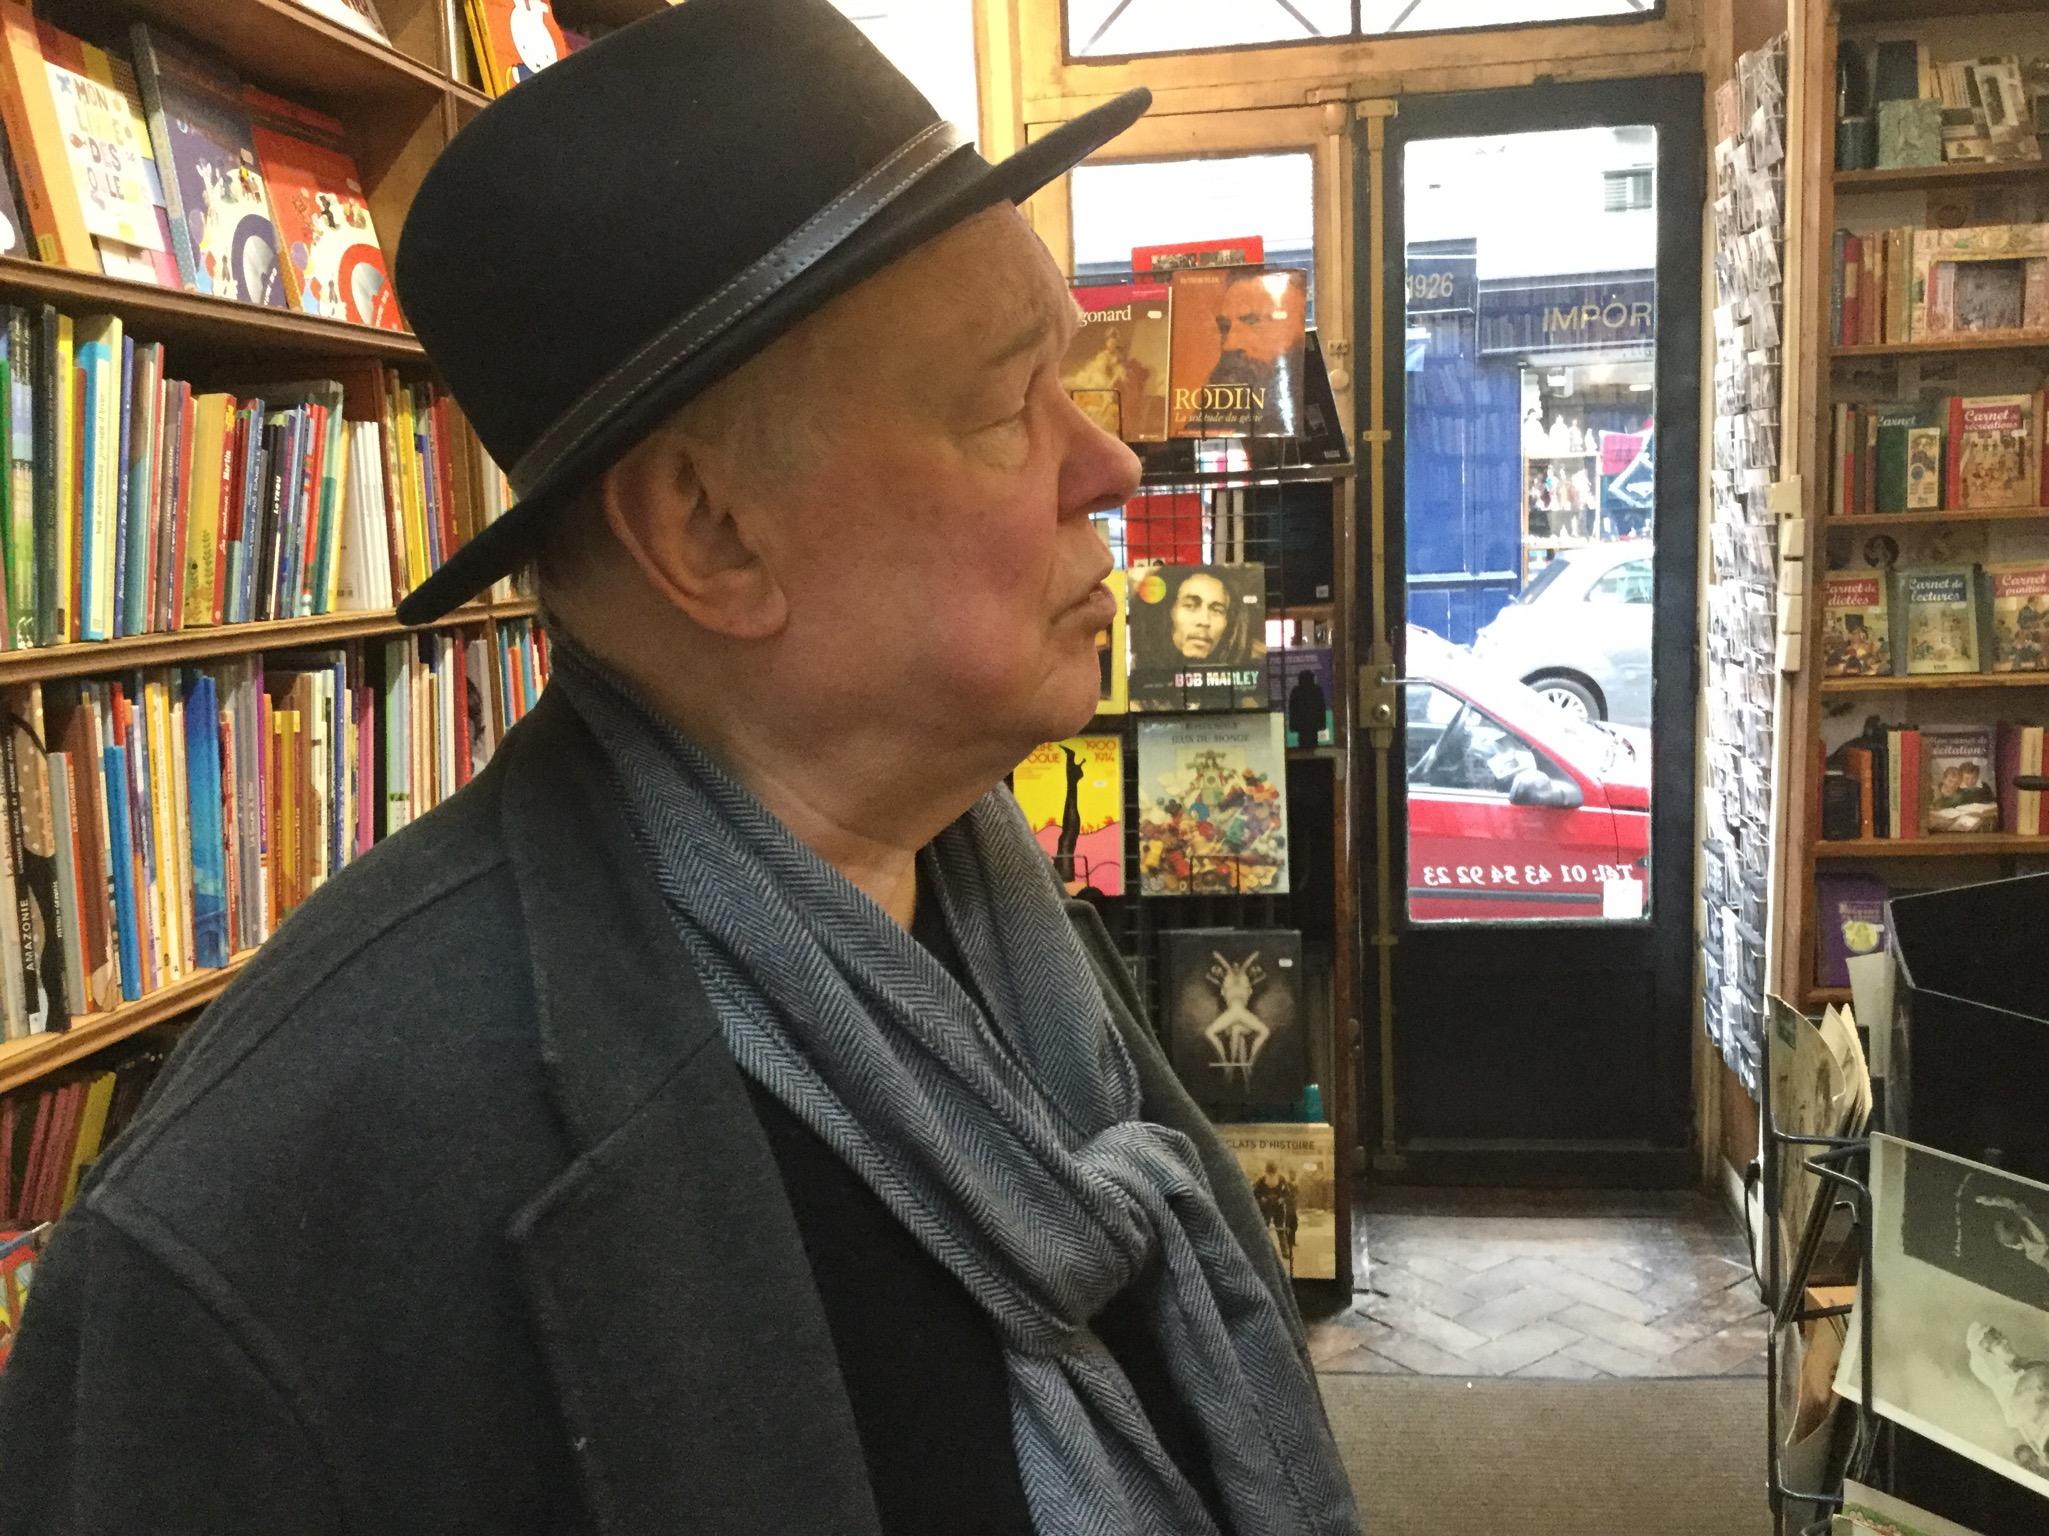 John at San Francisco Books, 6th arrondisement.